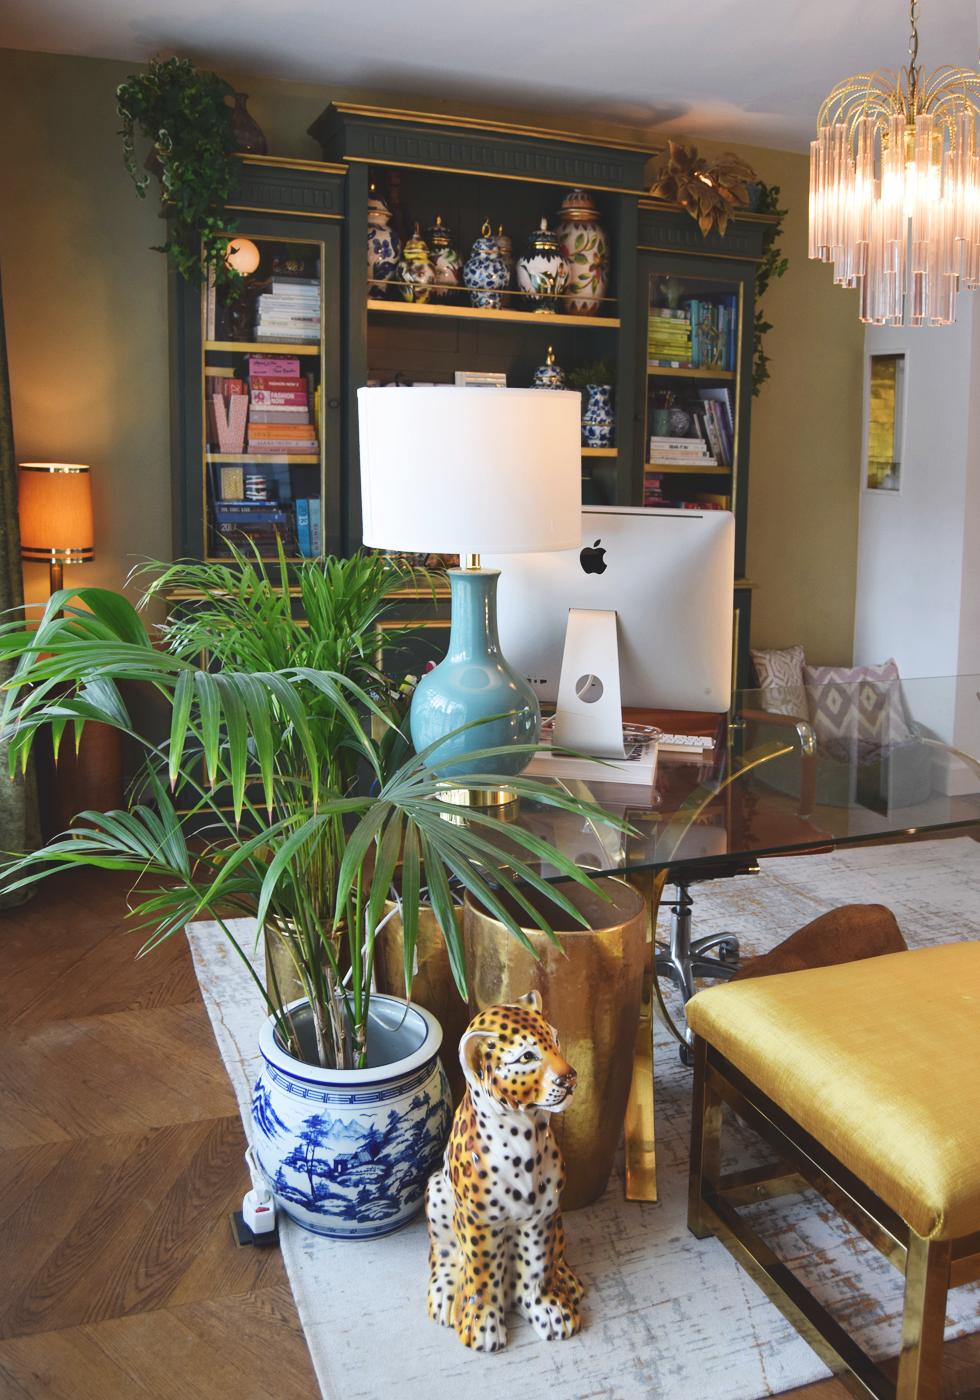 Interior, ARTE, Onlinetapijten, A La Collection, Farrow&Ball, office, desk, eclectic, hollywood glam, colorful